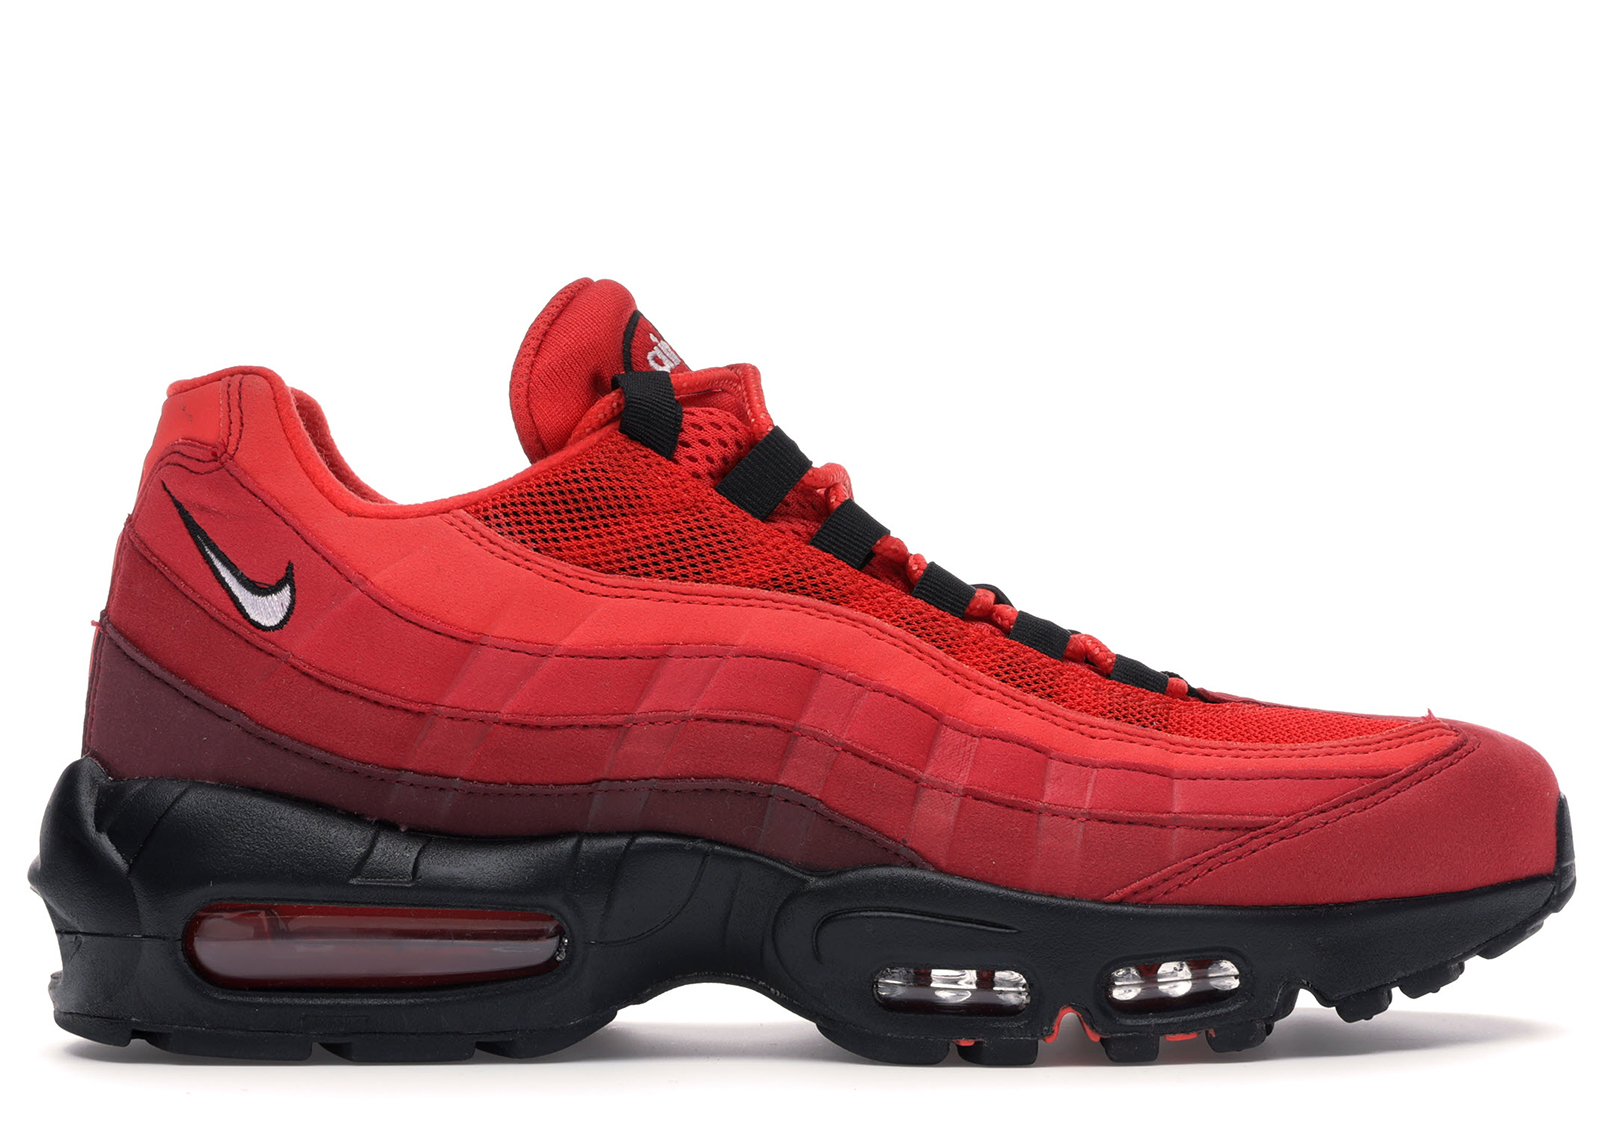 Nike Air Max 95 OG Habanero Red